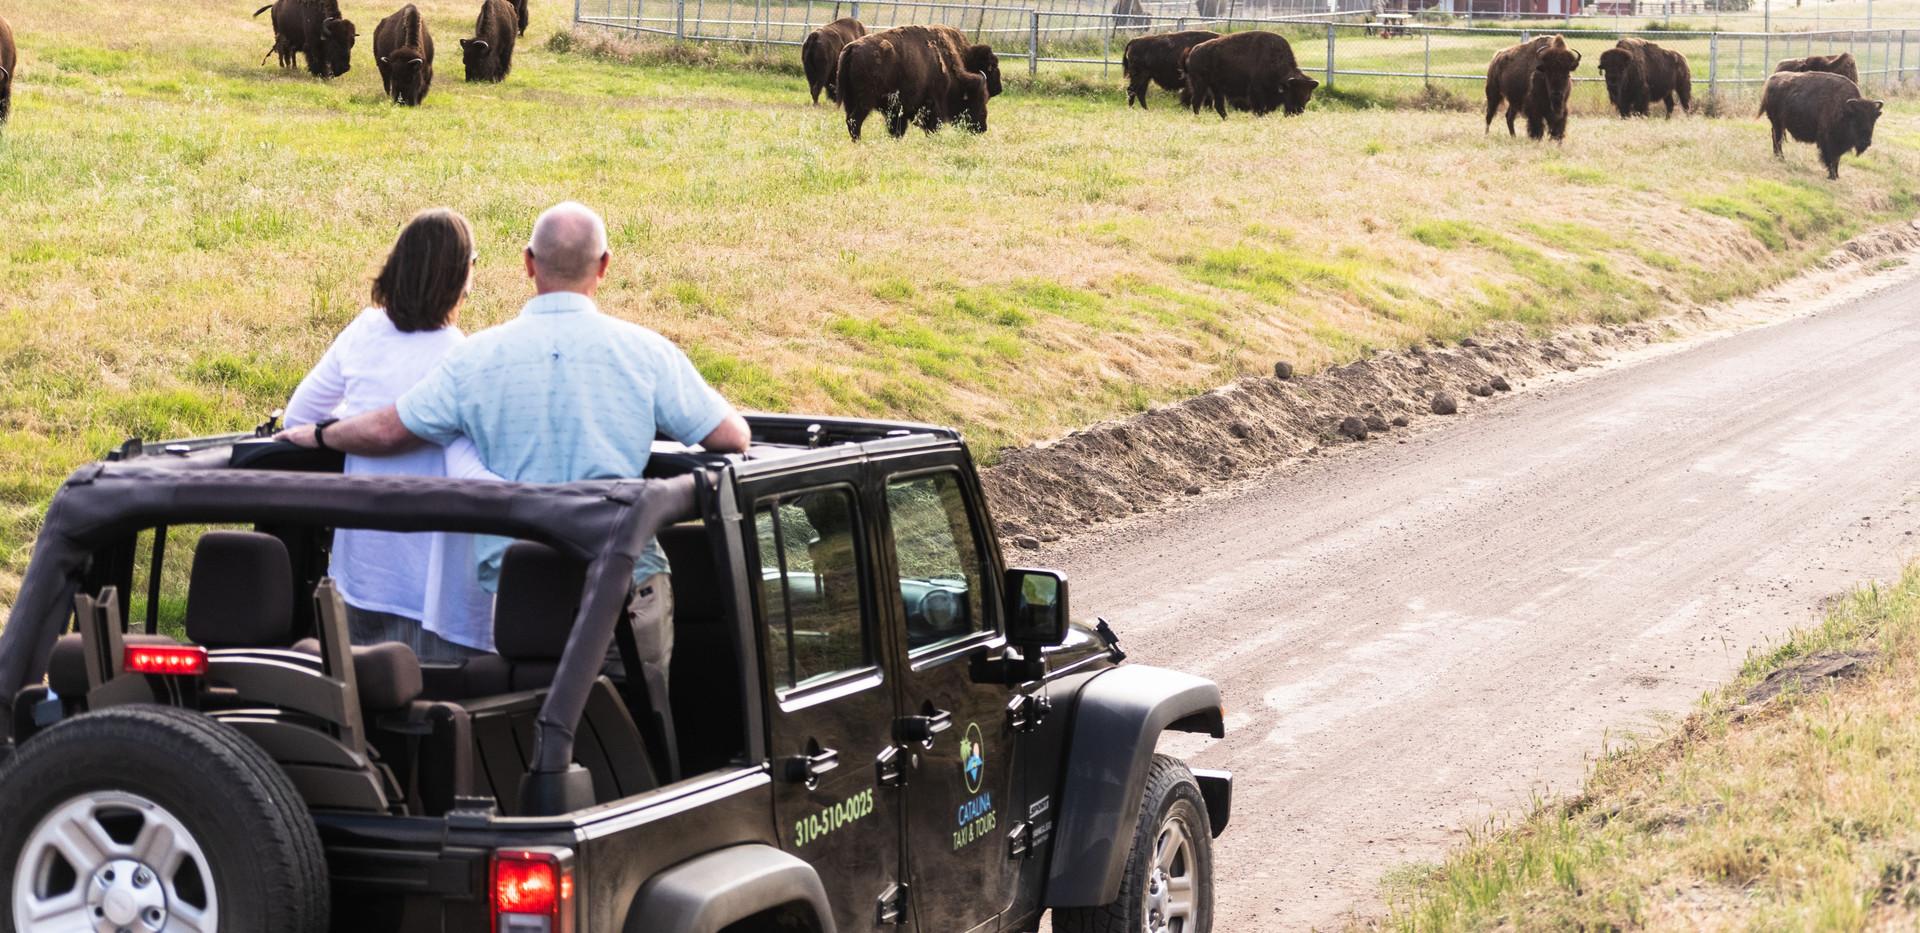 Jeep Tour of Catalina Island